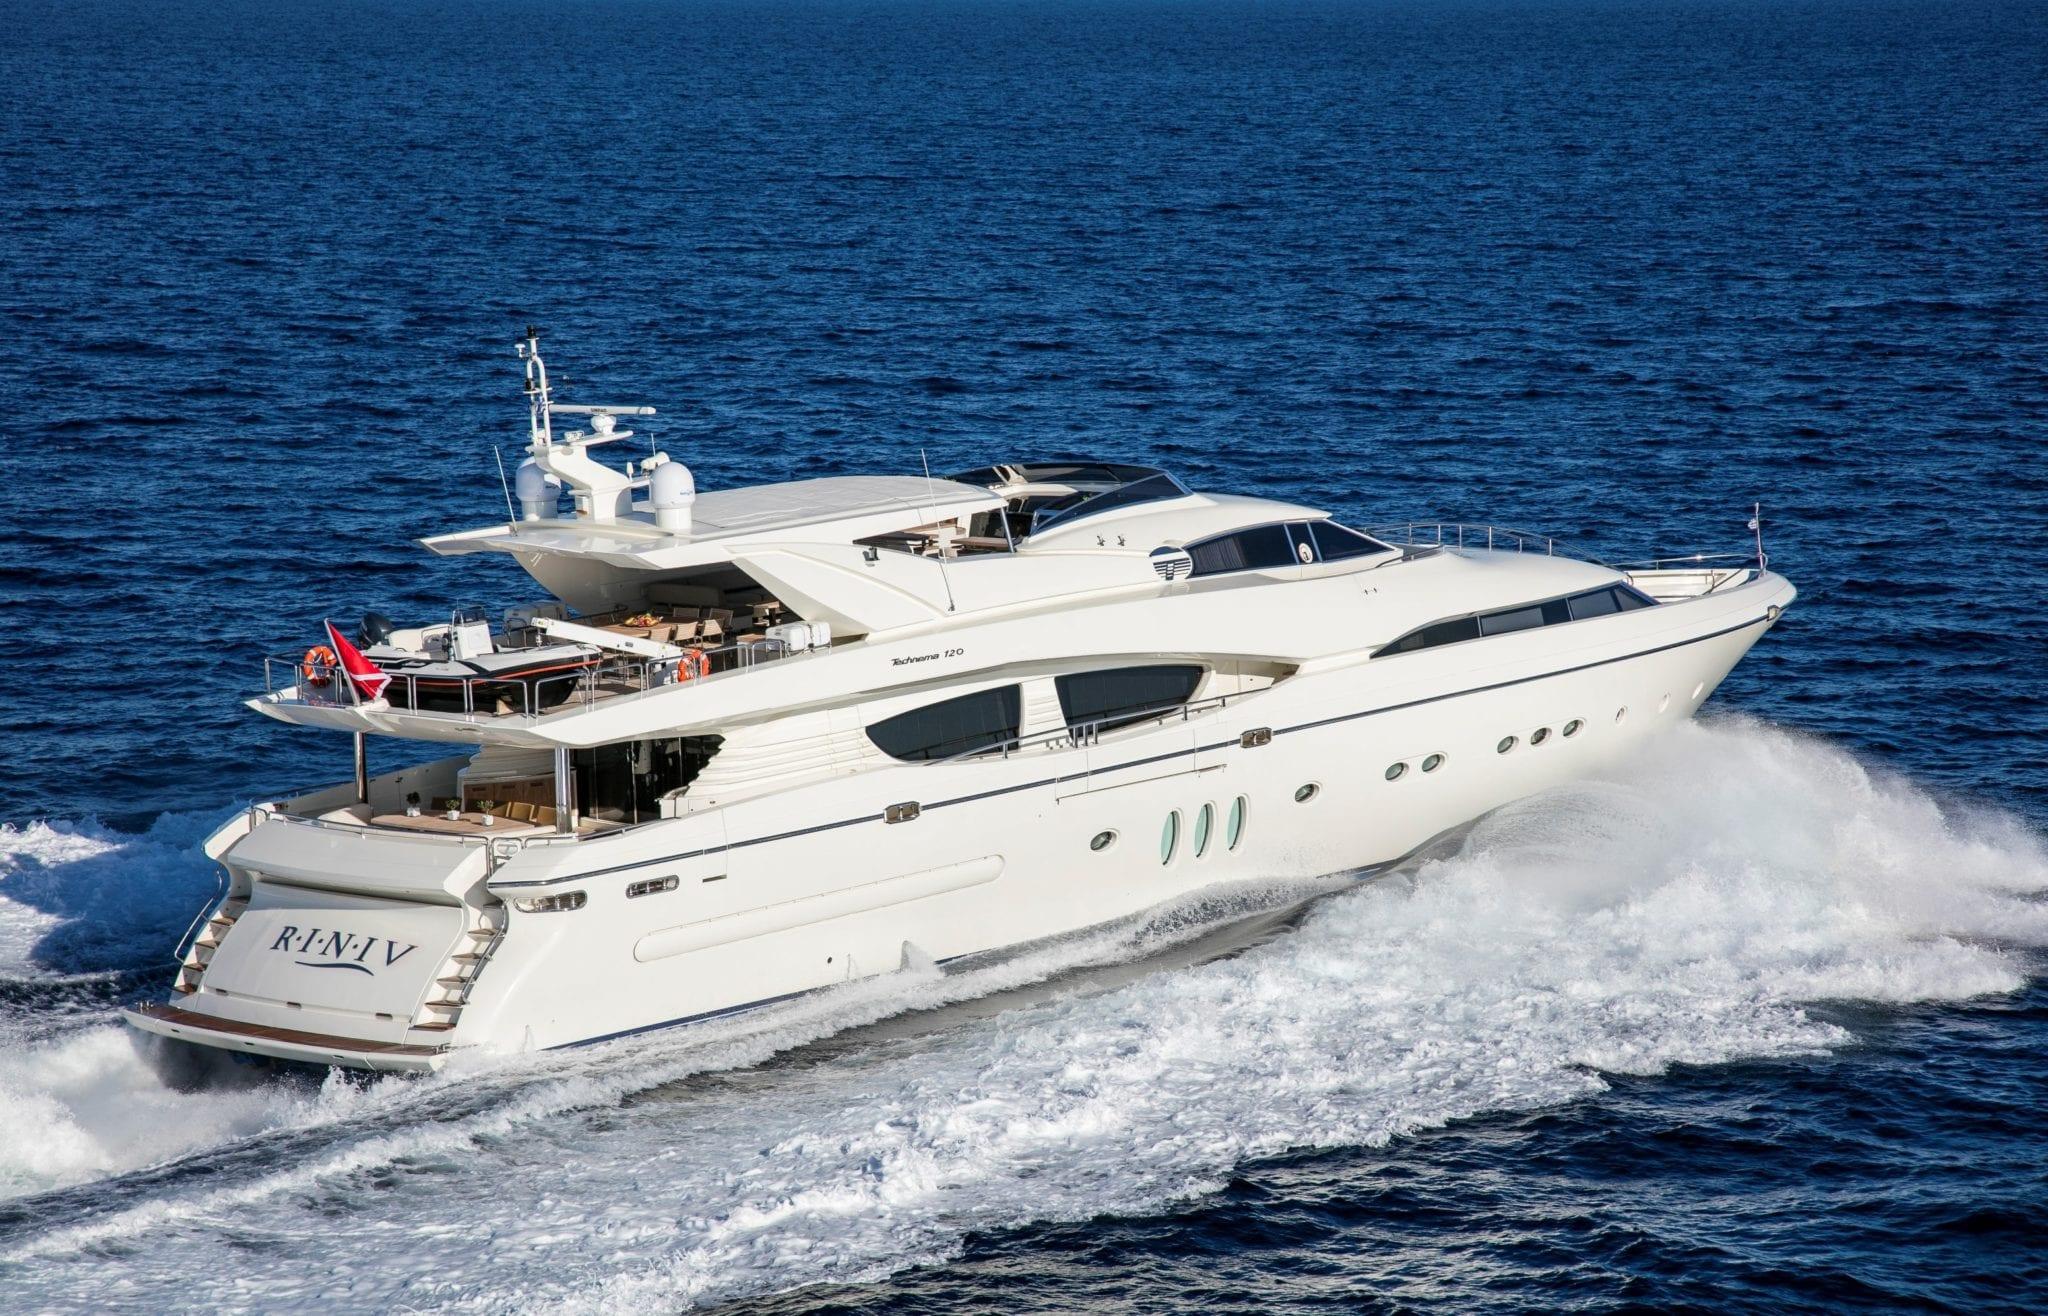 rini v motor yacht profile min -  Valef Yachts Chartering - 4834